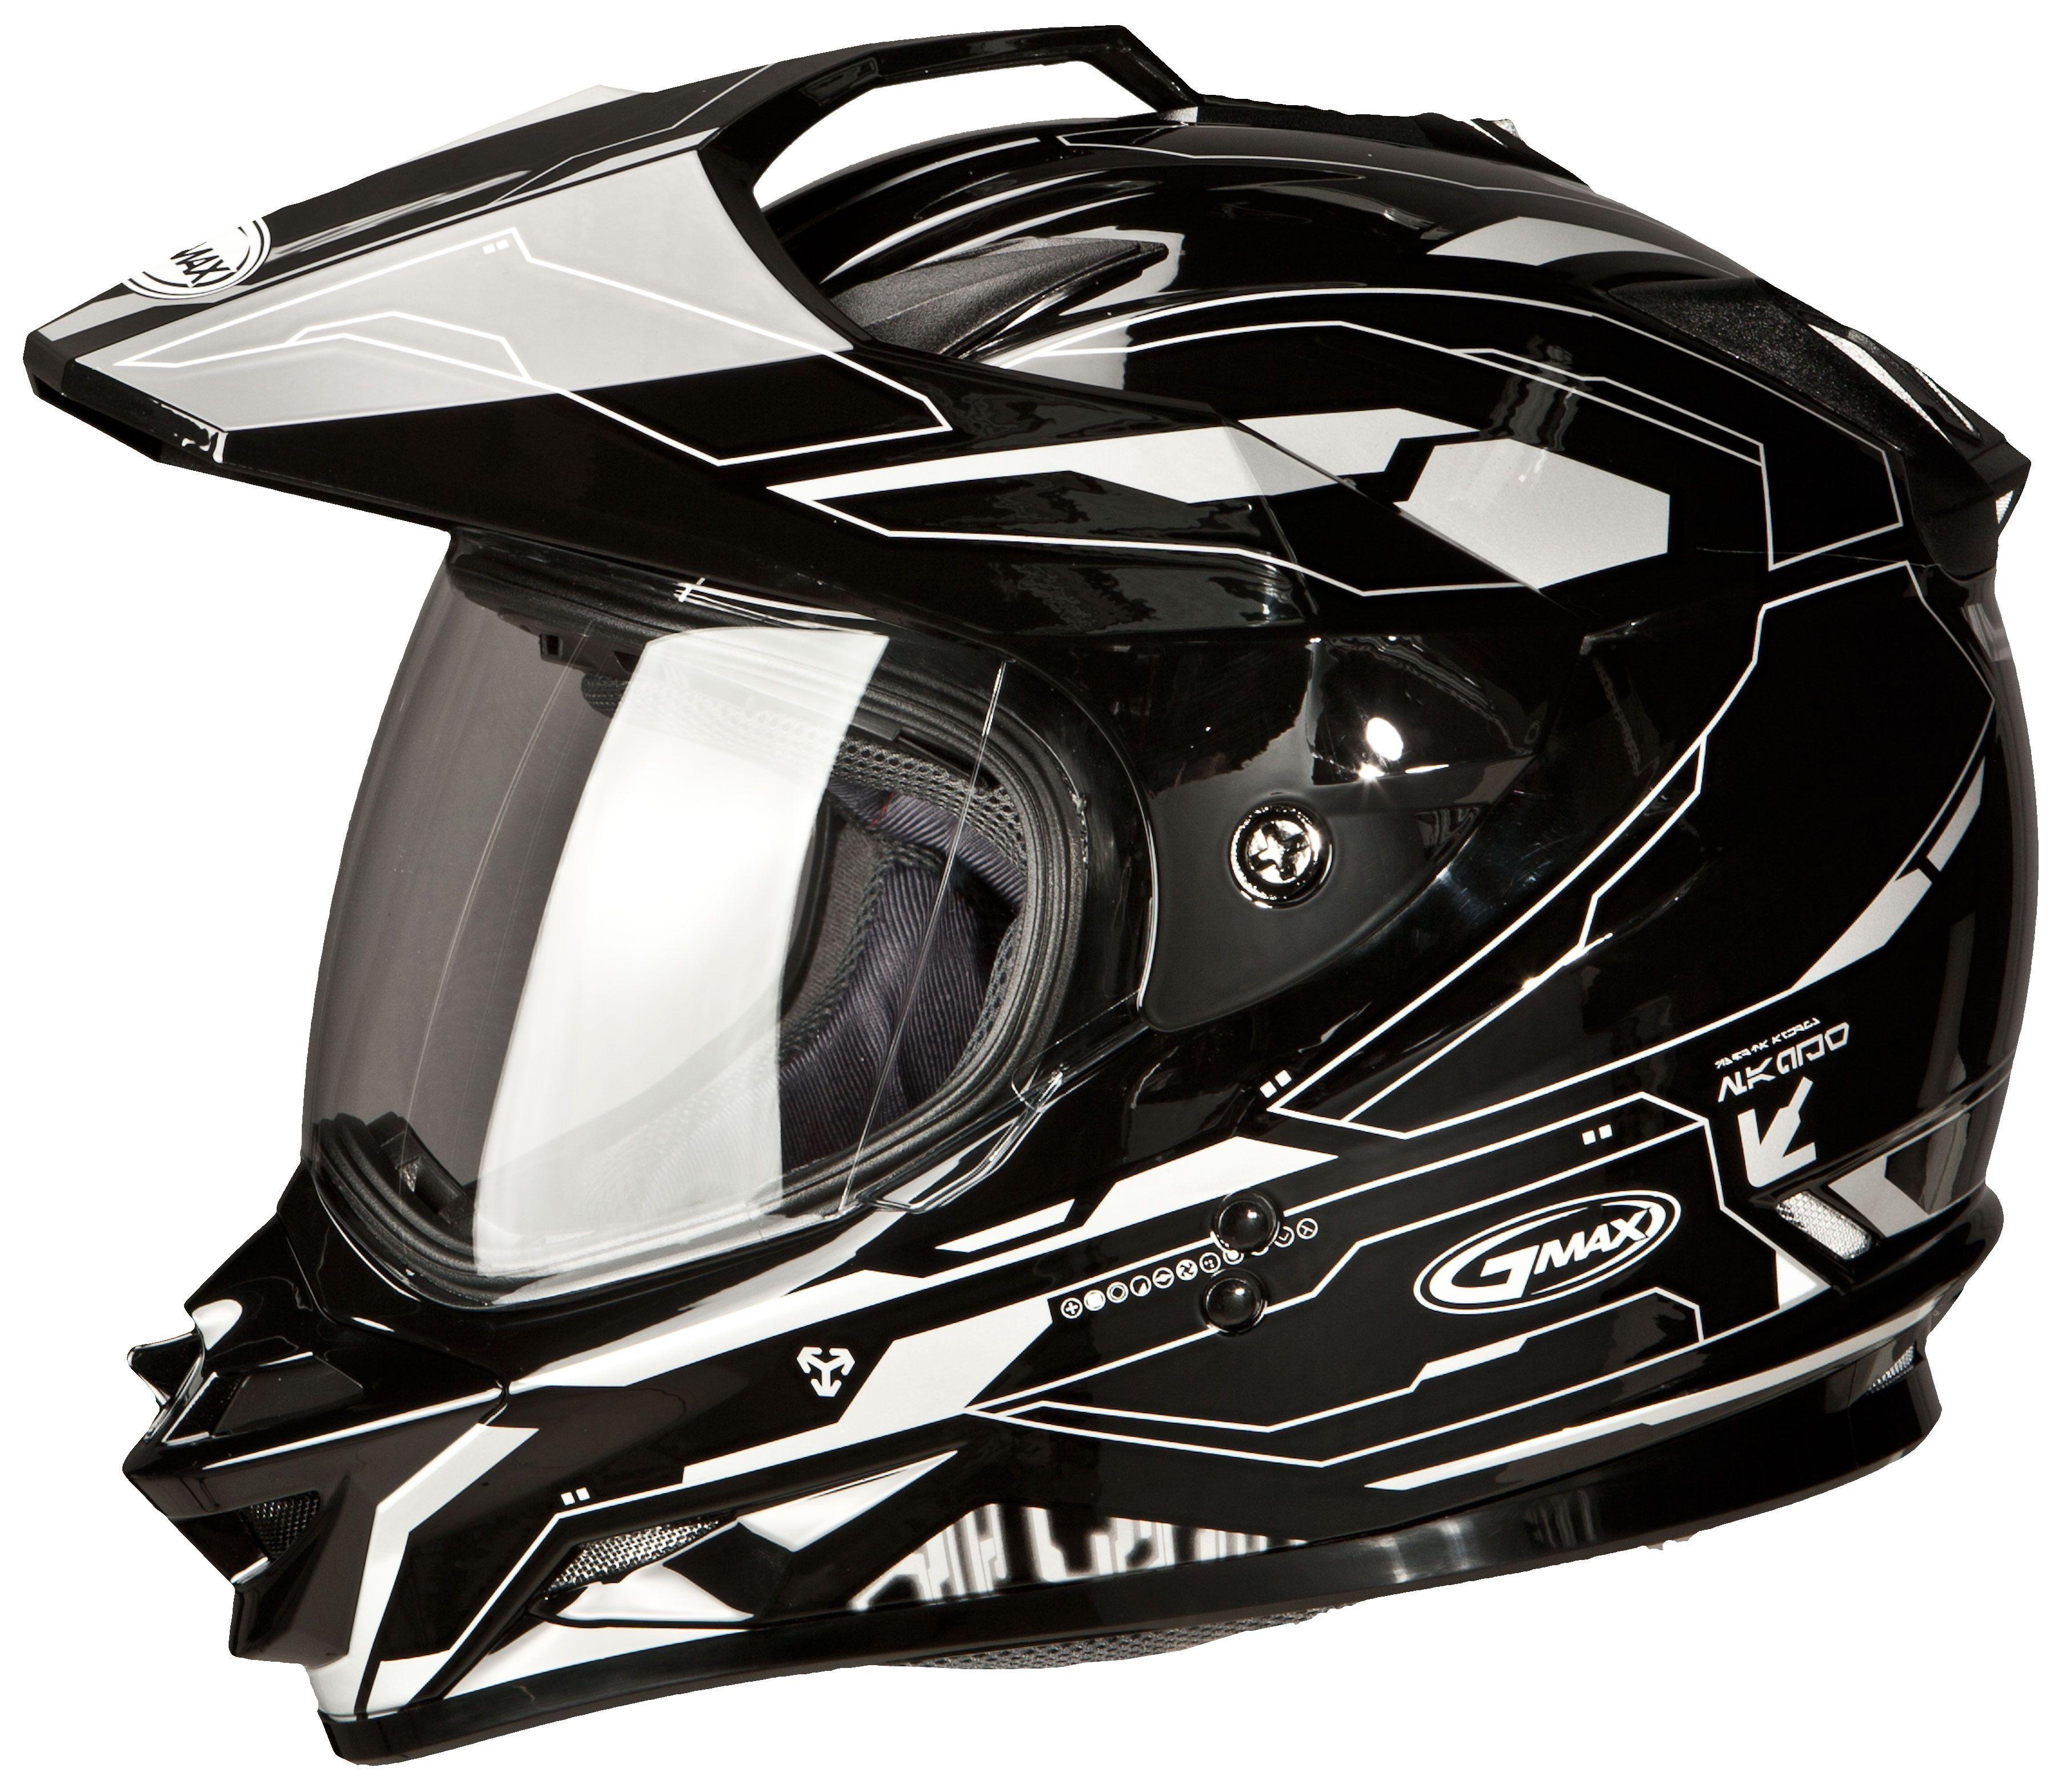 GMax GM69 Helmet - Solid - RevZilla